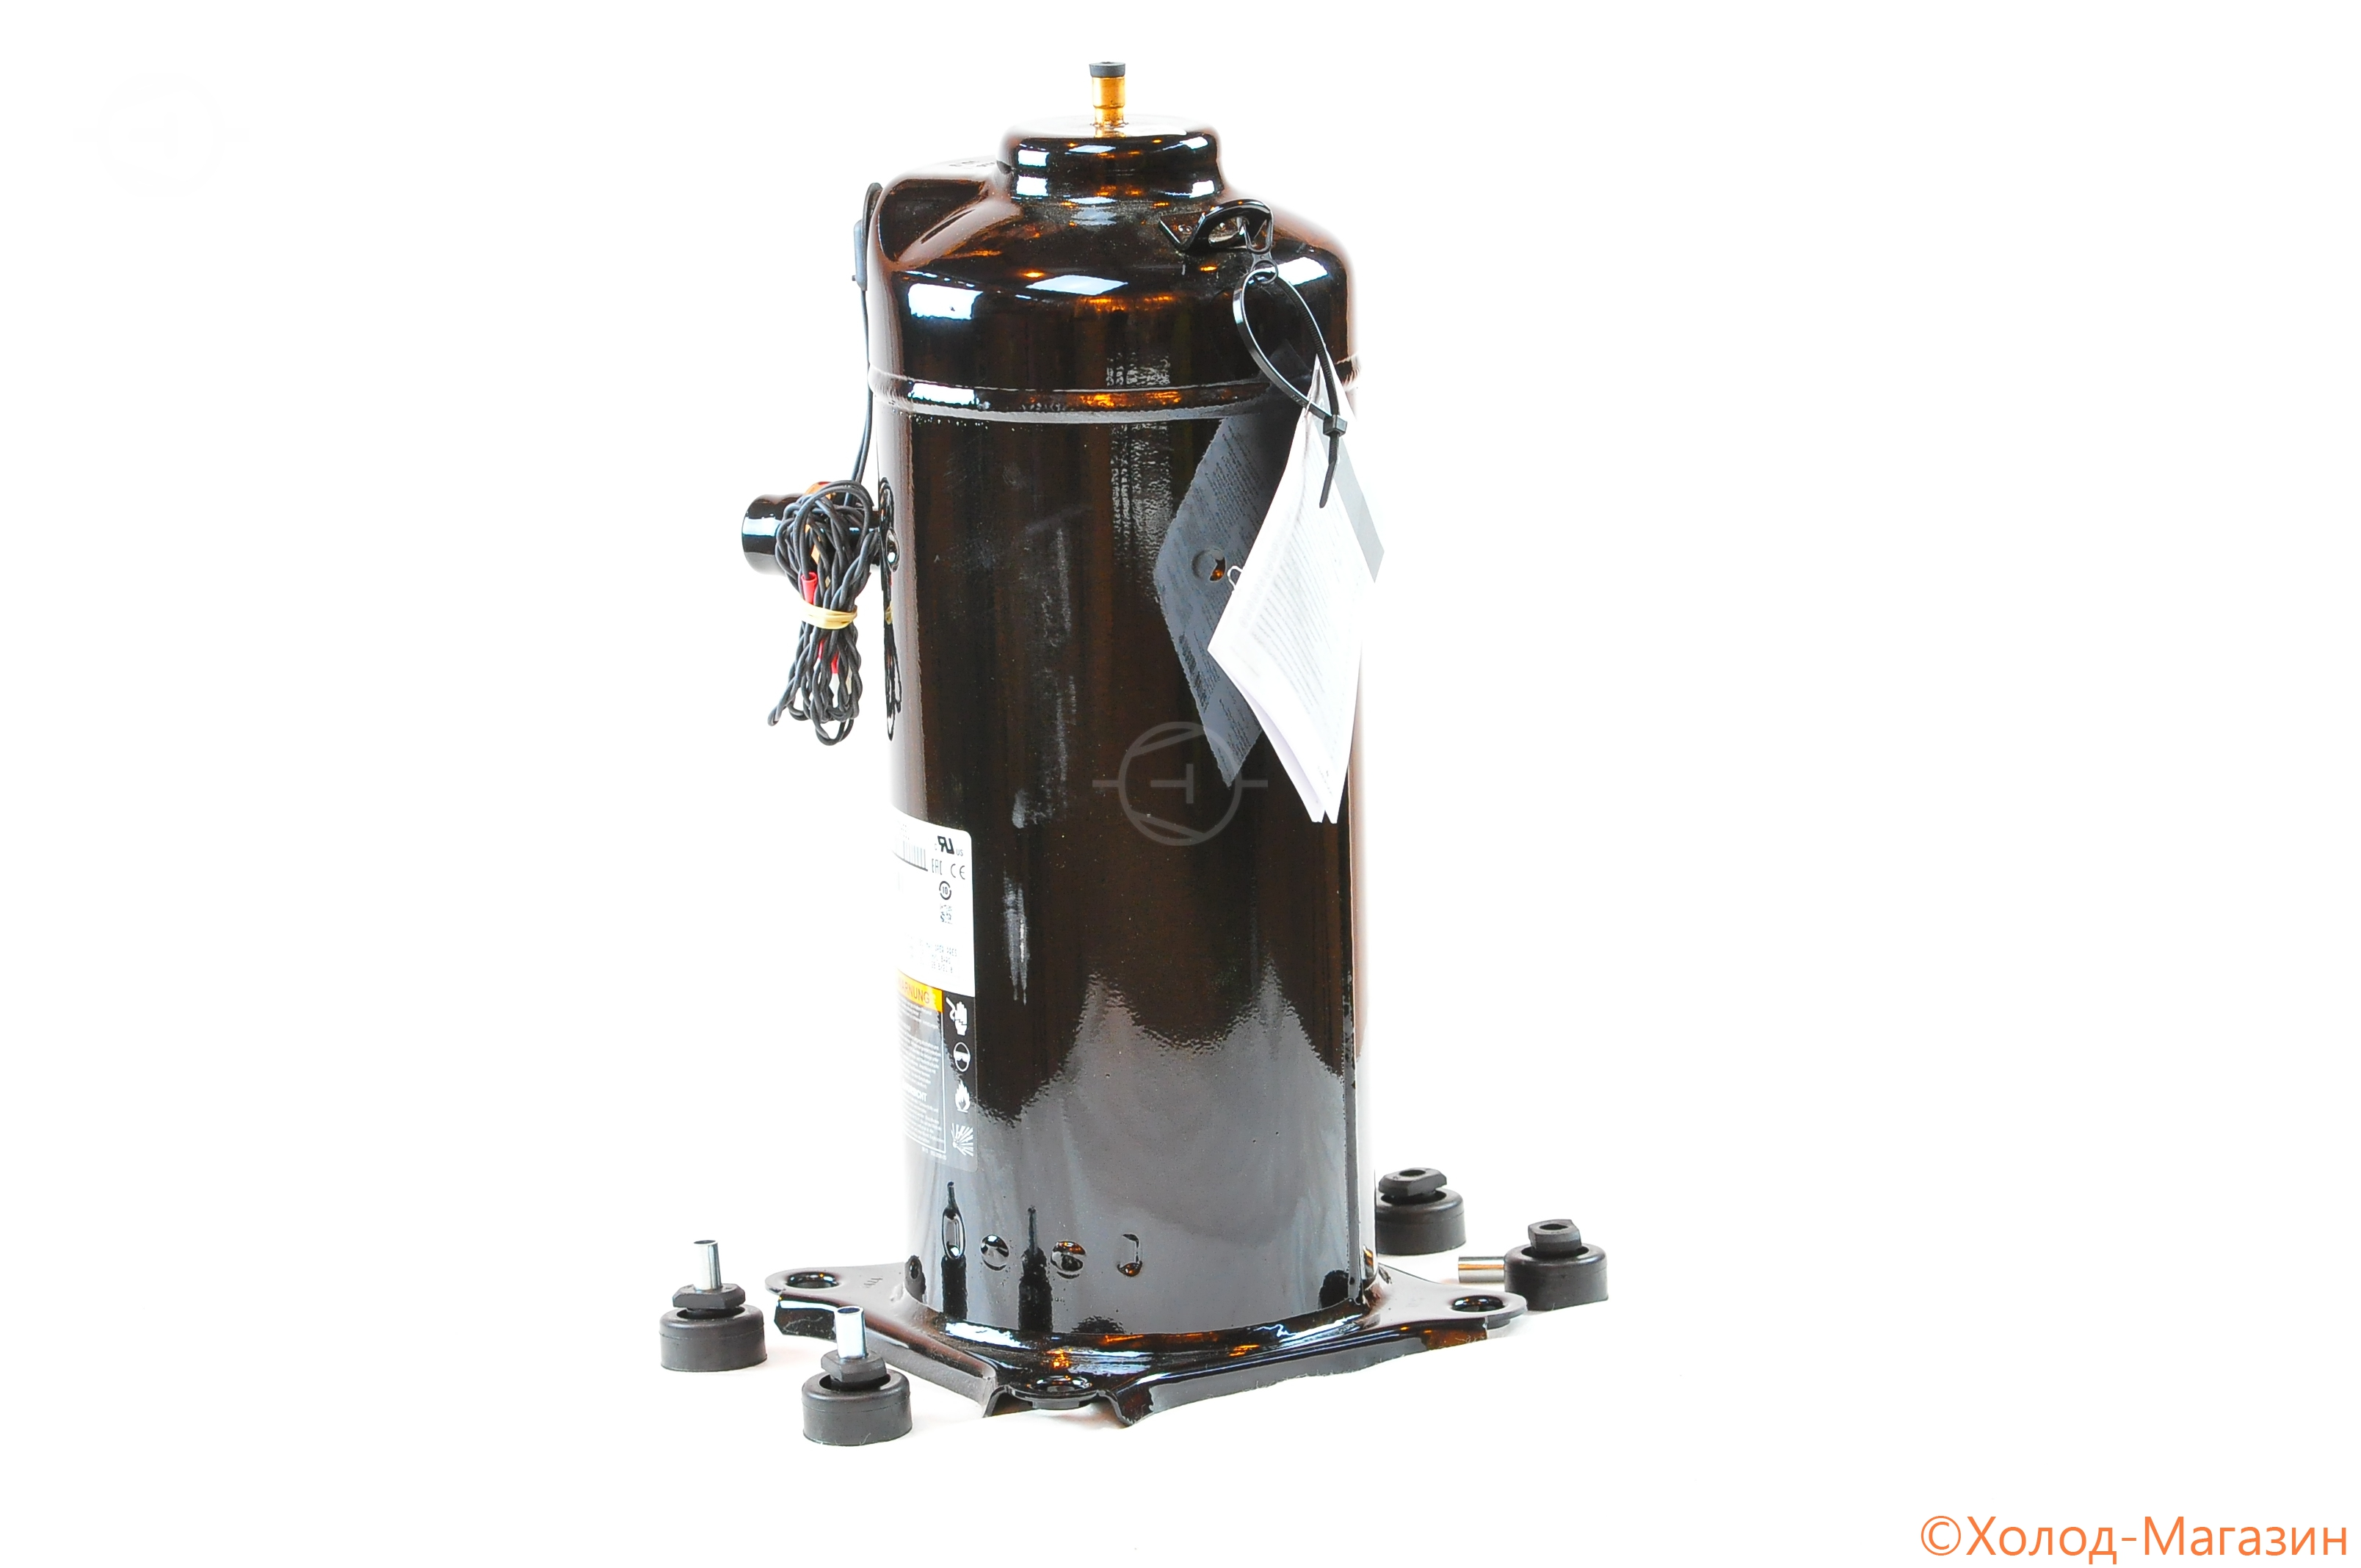 Компрессор спиральный ZBD 38 KCE-TFD-551 Copeland, Emerson